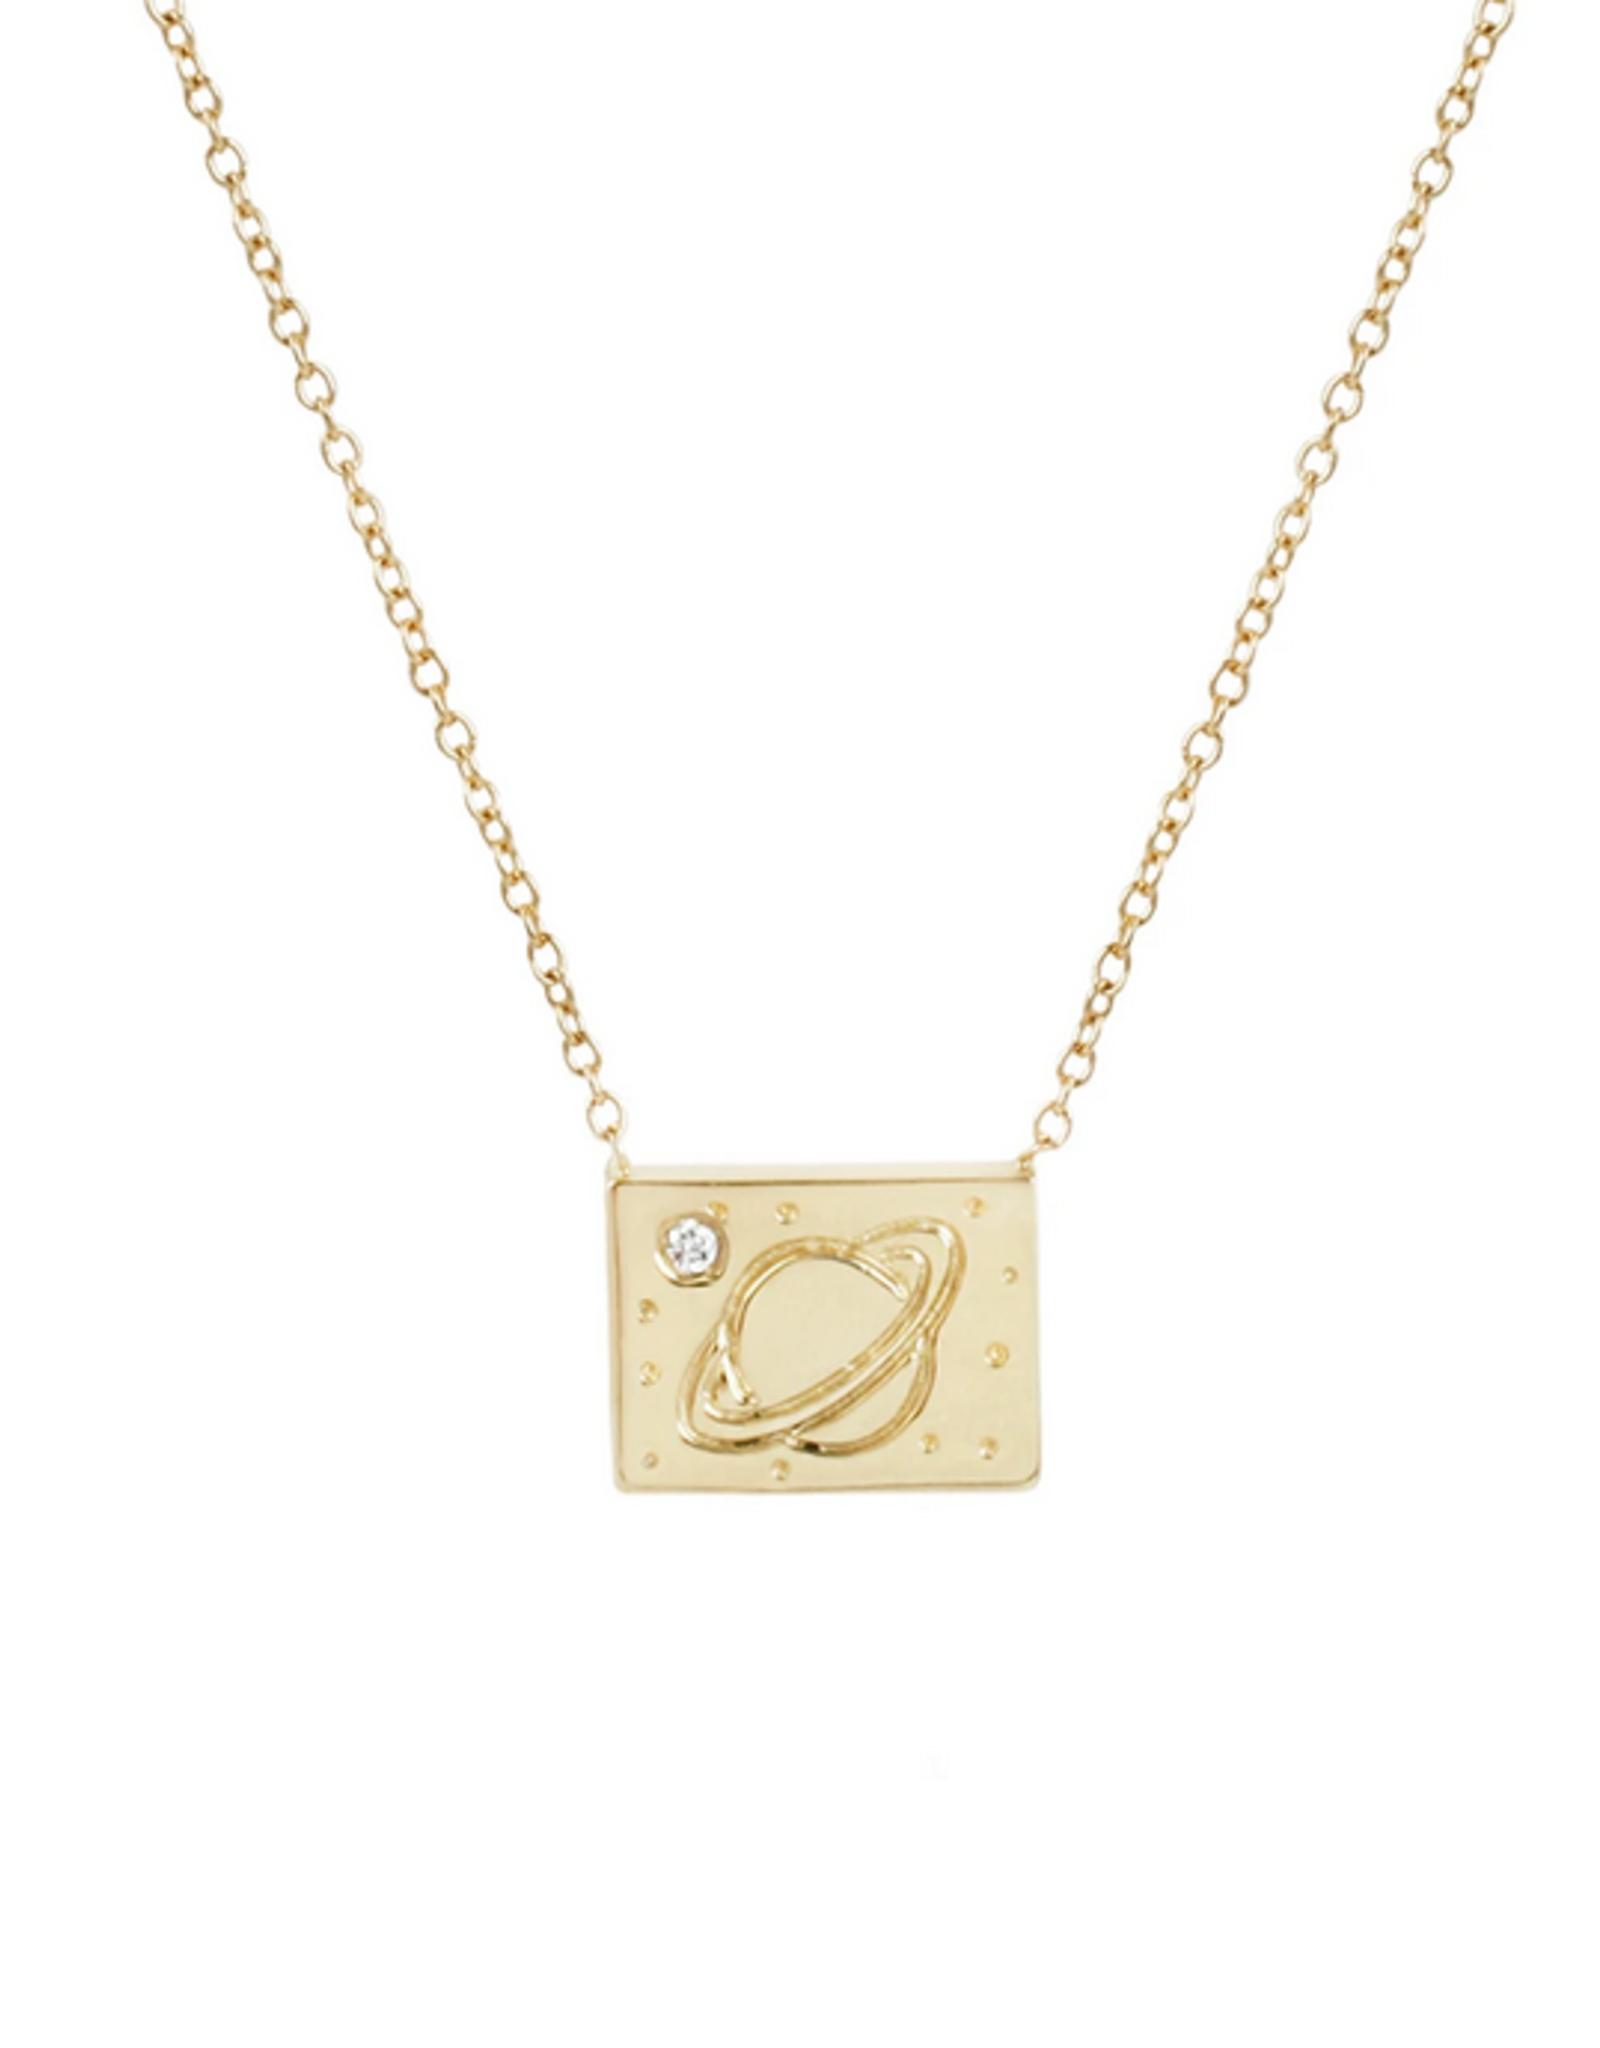 Aili Saturn Postcard Charm Necklace